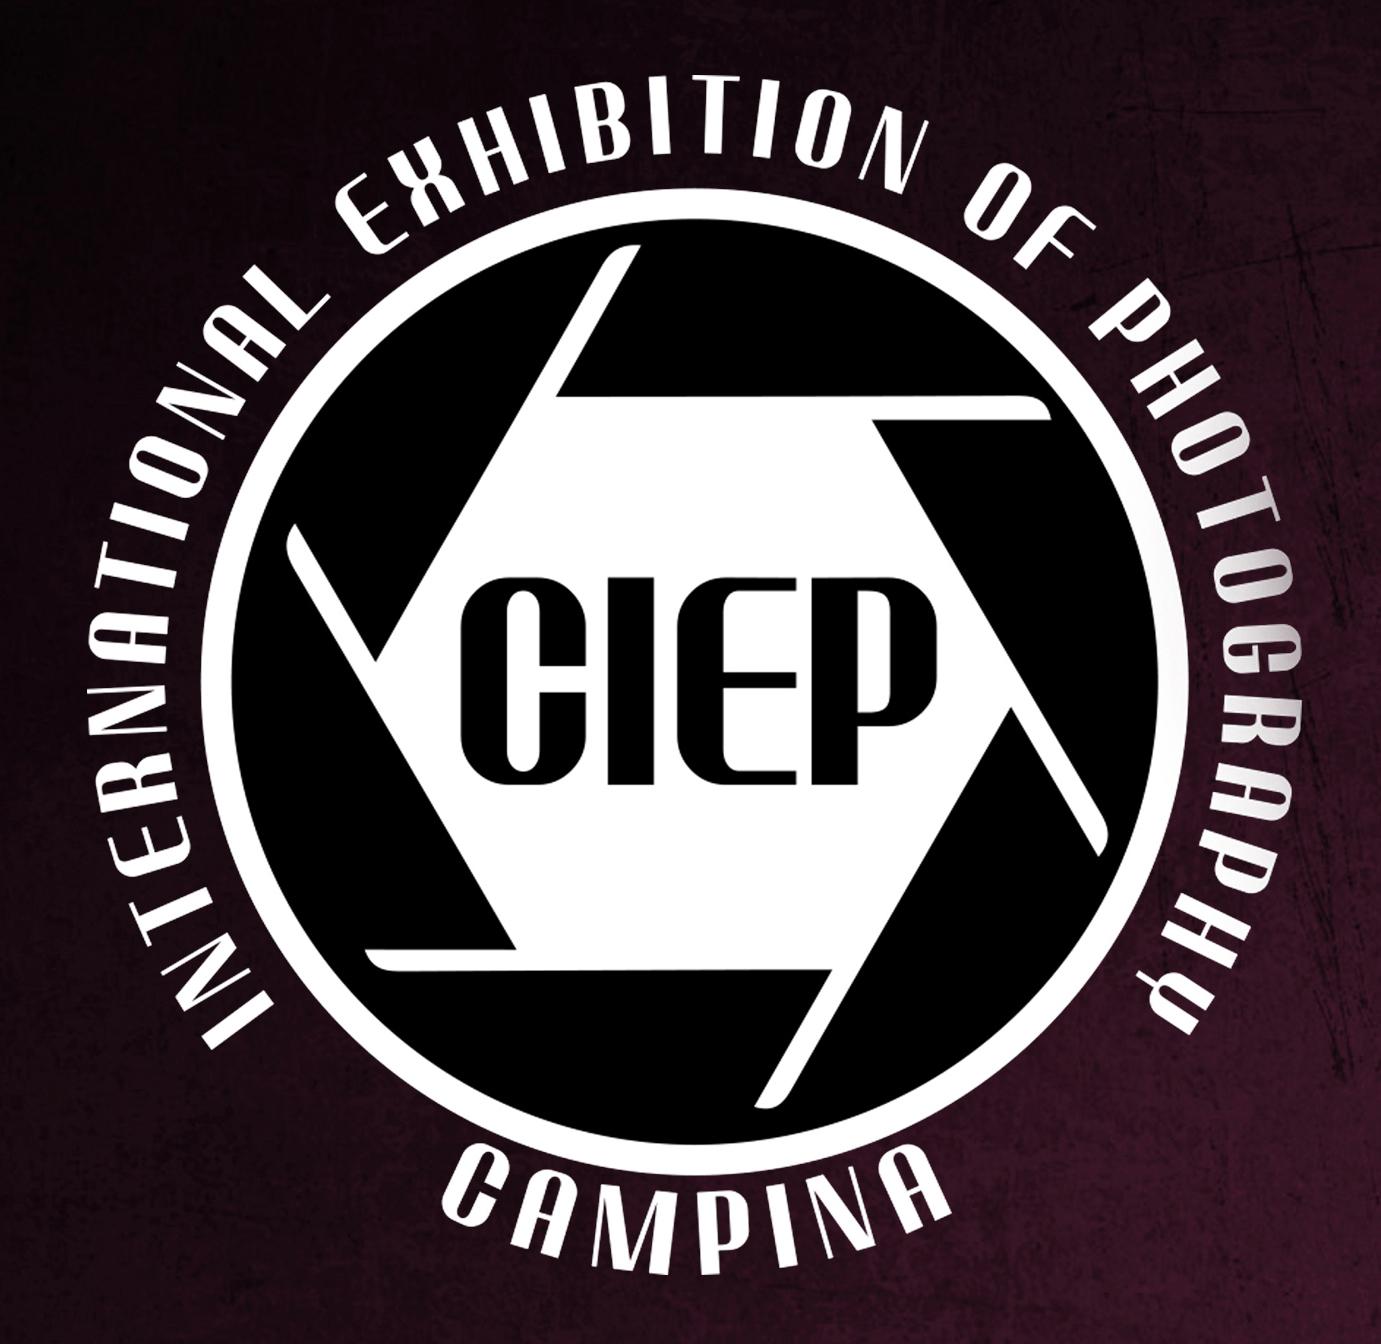 4th CAMPINA 2019 International Exhibition of Photography, Romania - logo